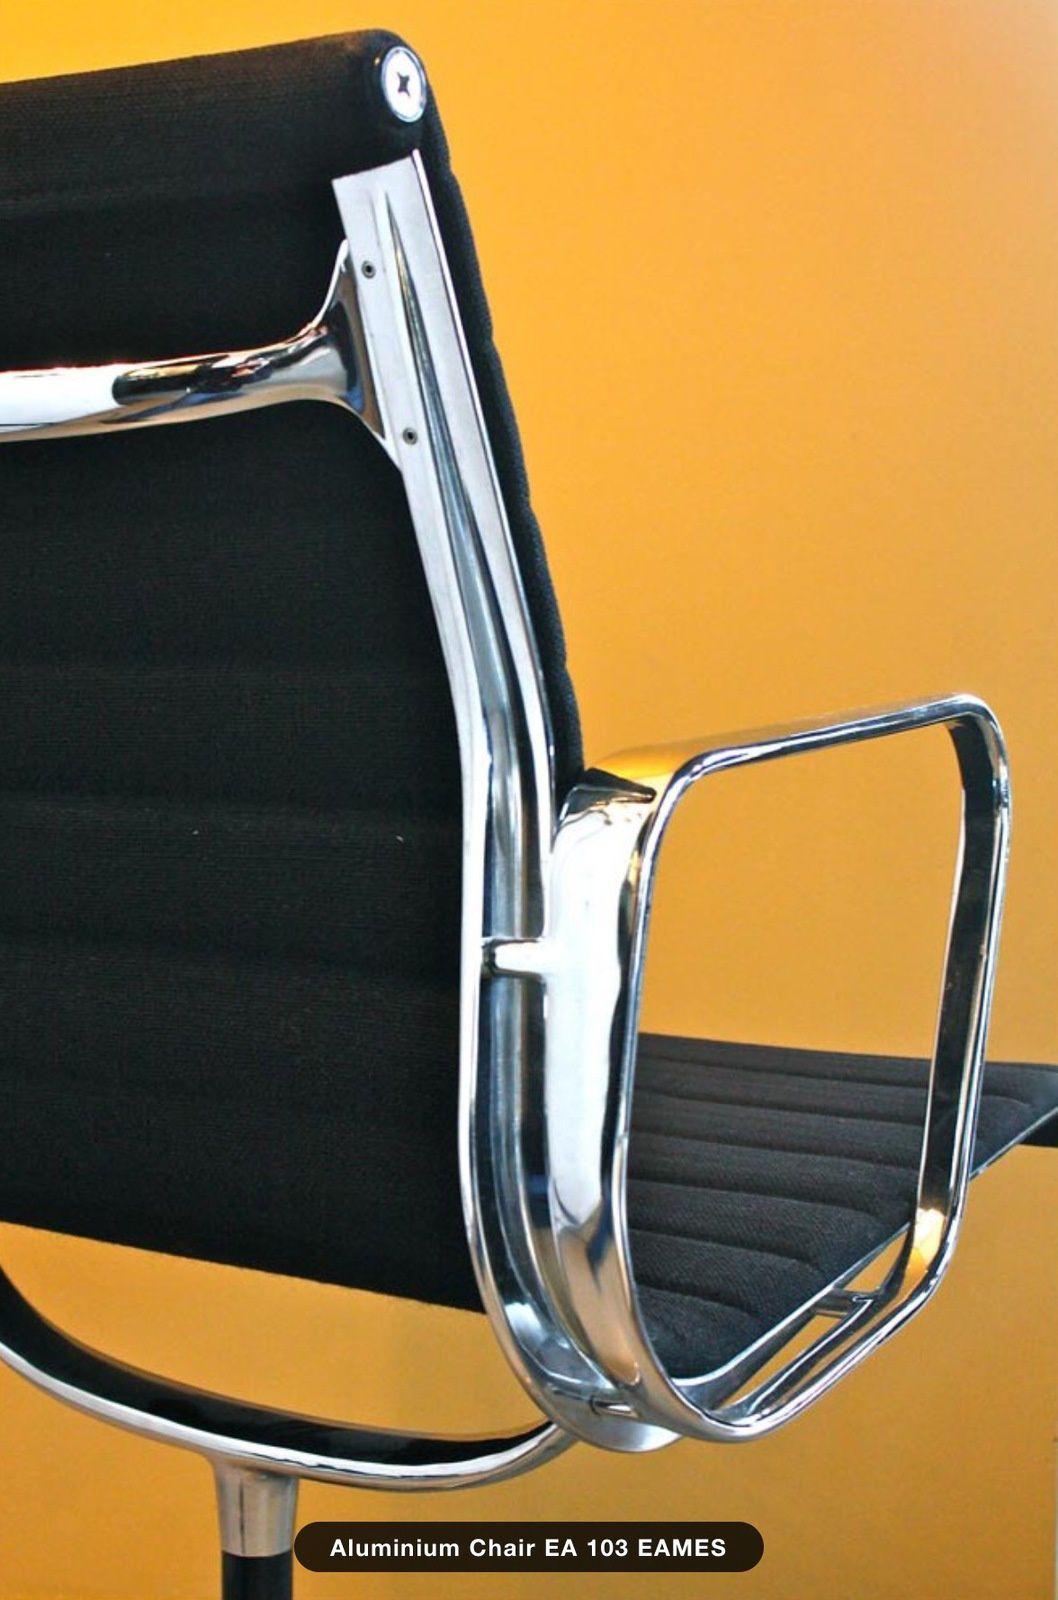 Aluminium Chair EA 103 EAMES (vendu)